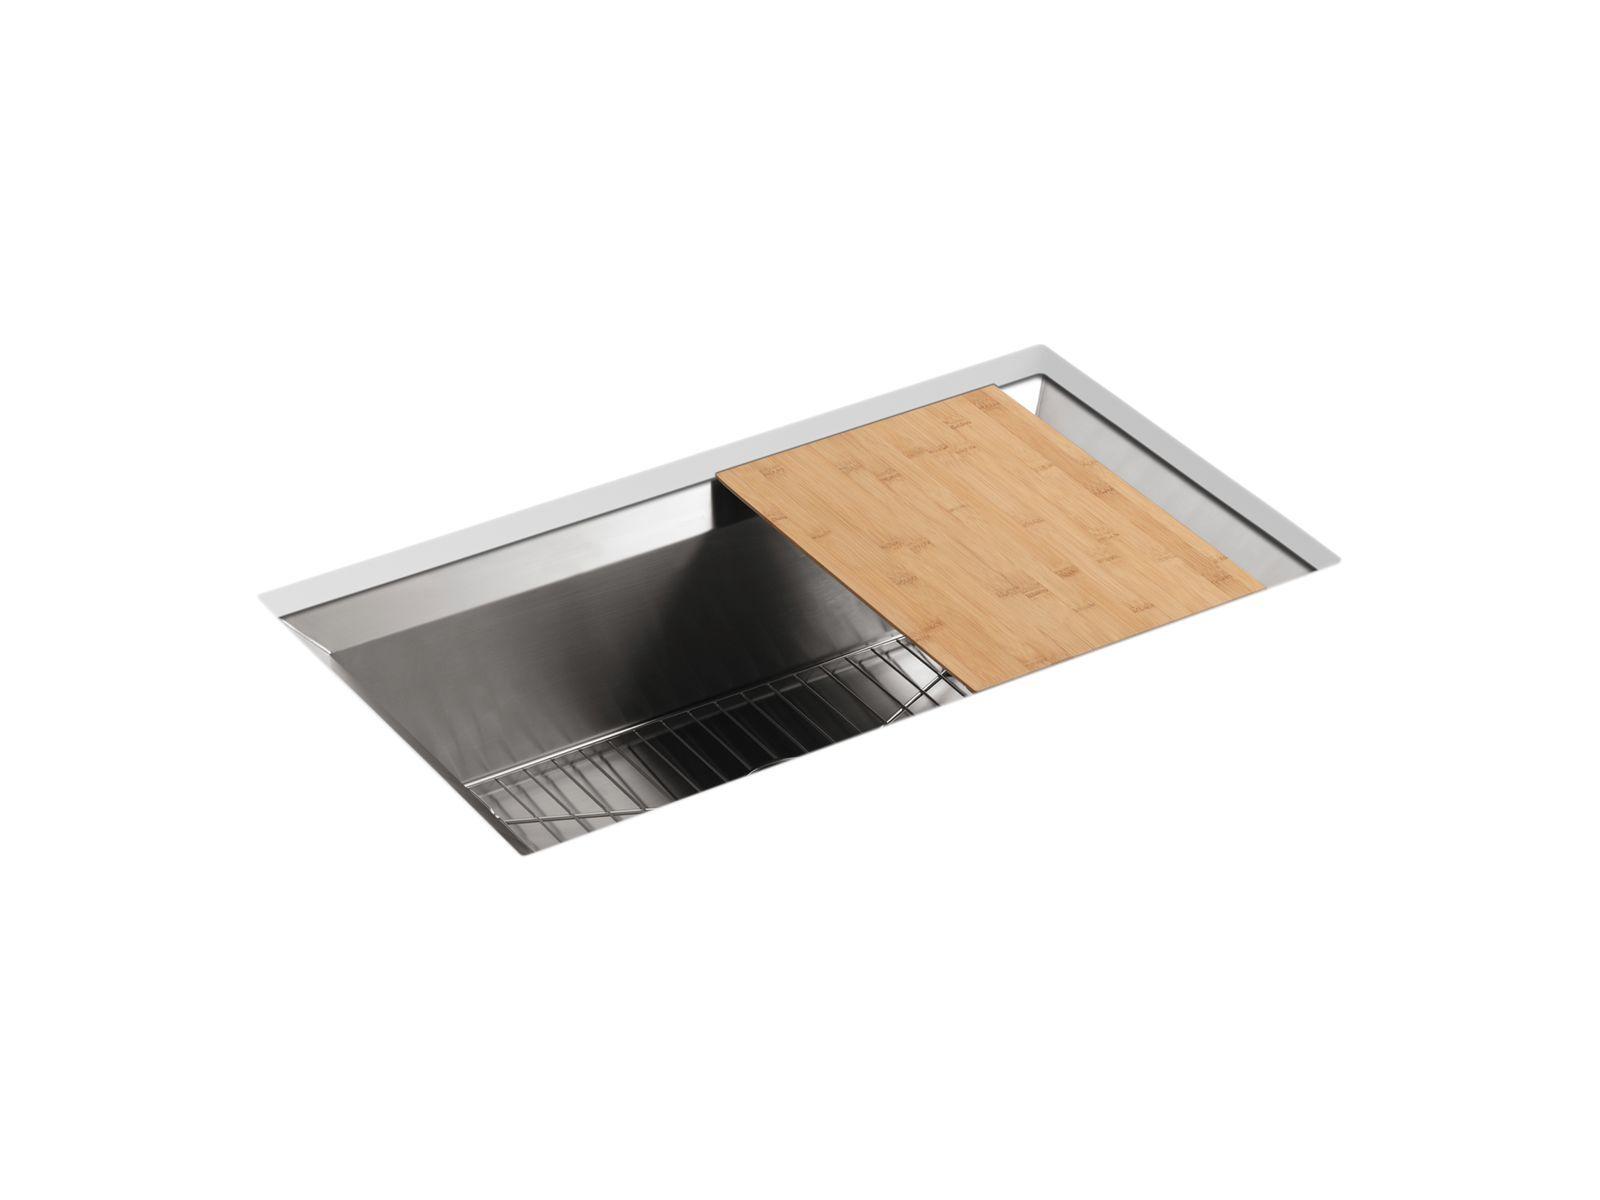 Schon Poise Under Mount Single Bowl Kitchen Sink | K 3158 | KOHLER